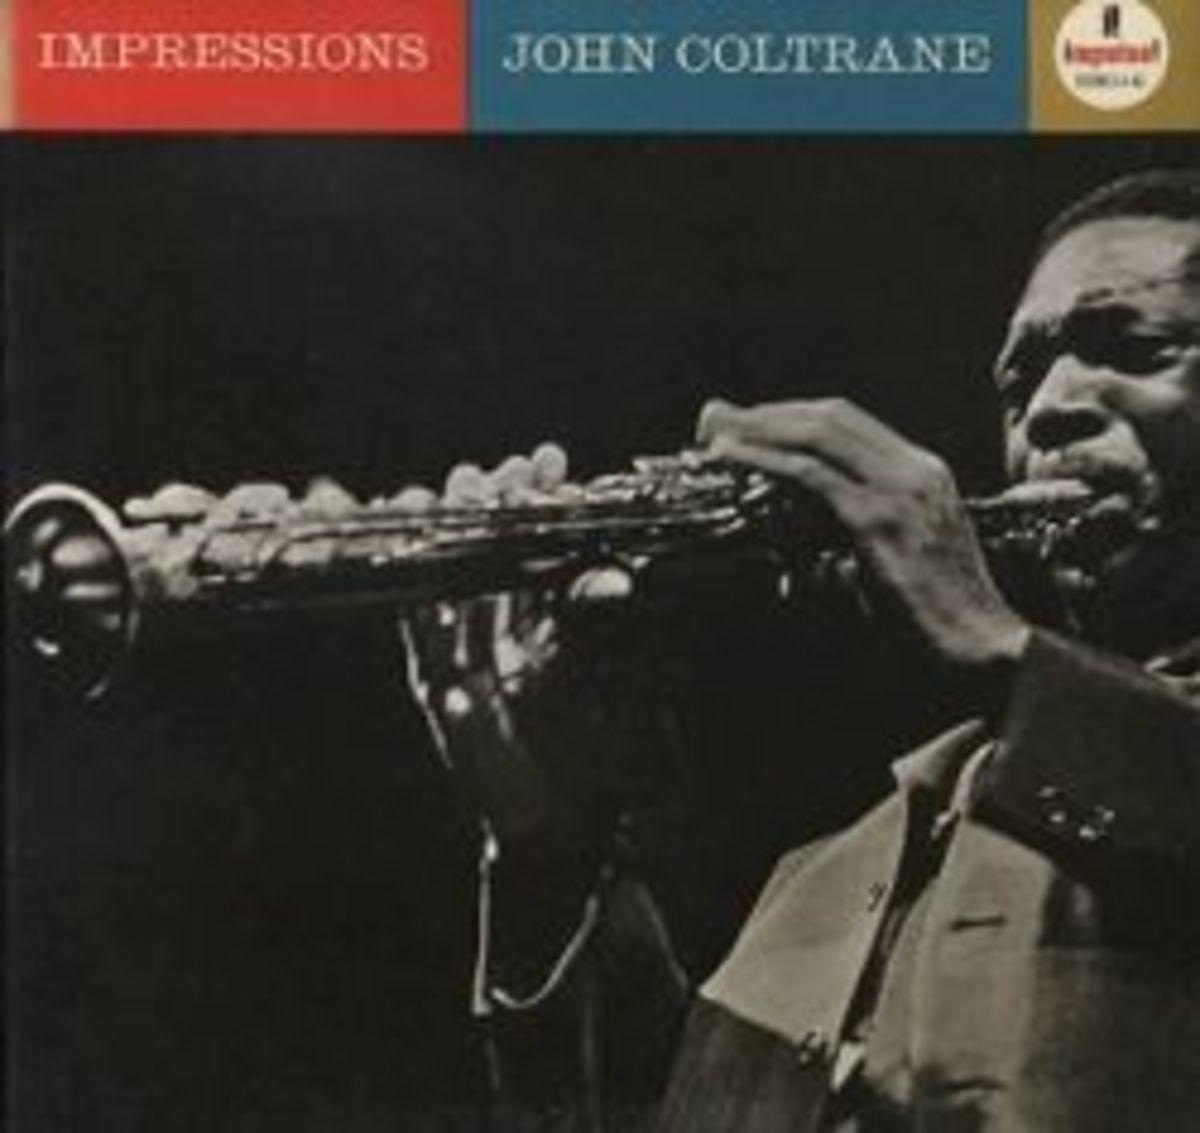 "John Coltrane ""Impressions"" Impulse Records A-42 12"" LP Vinyl Record"